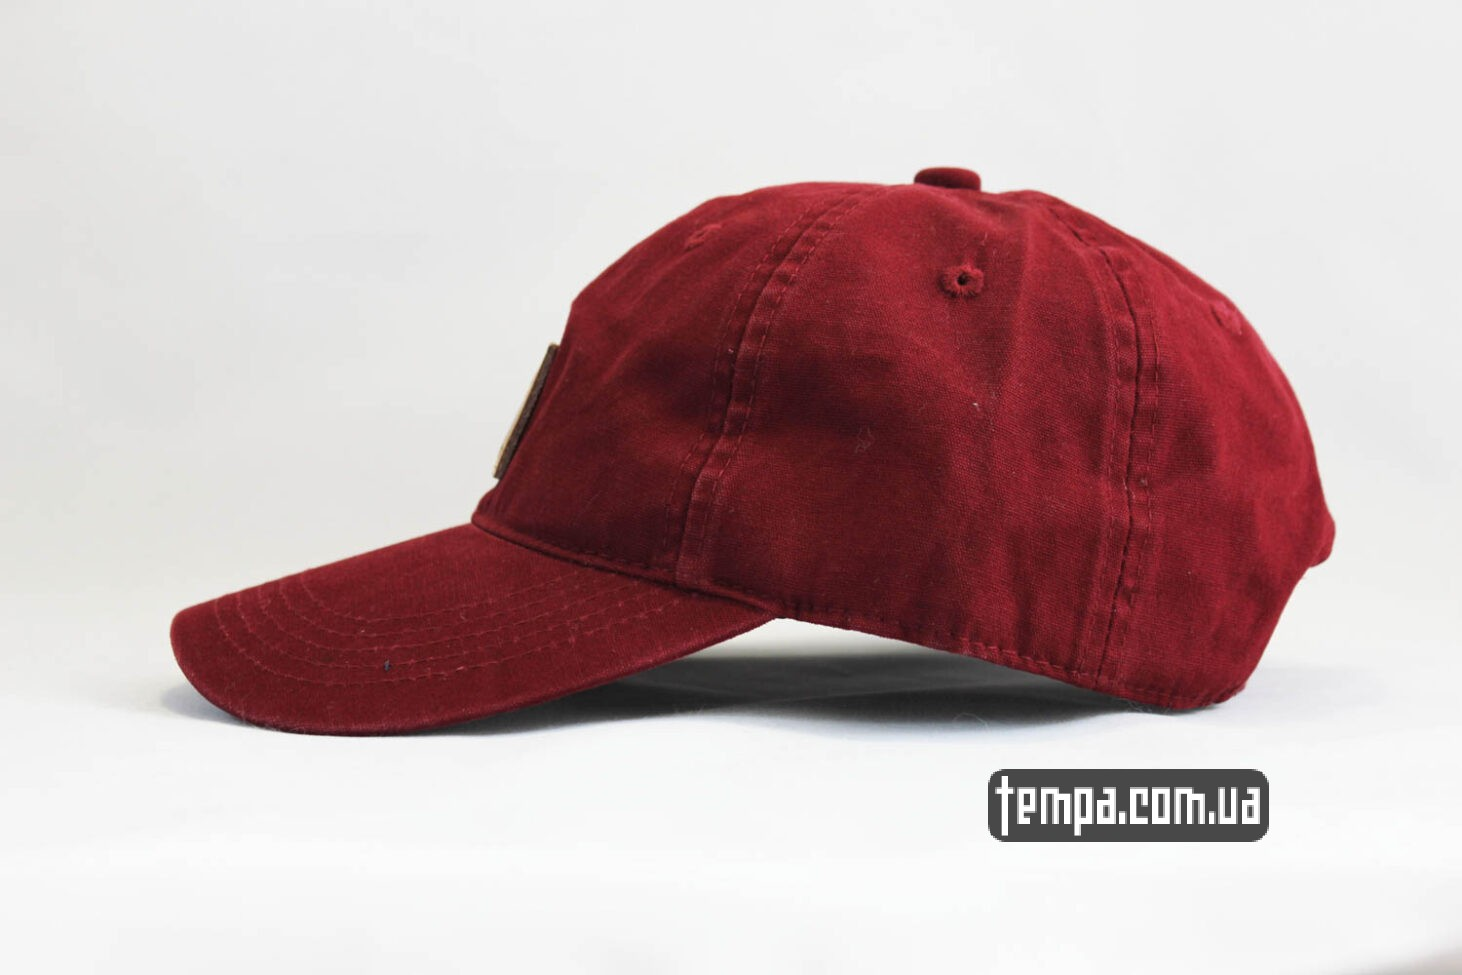 Carhartt Украина купить оригинал кепка бейсболка snapback Carhartt бордовая кожаный логотип